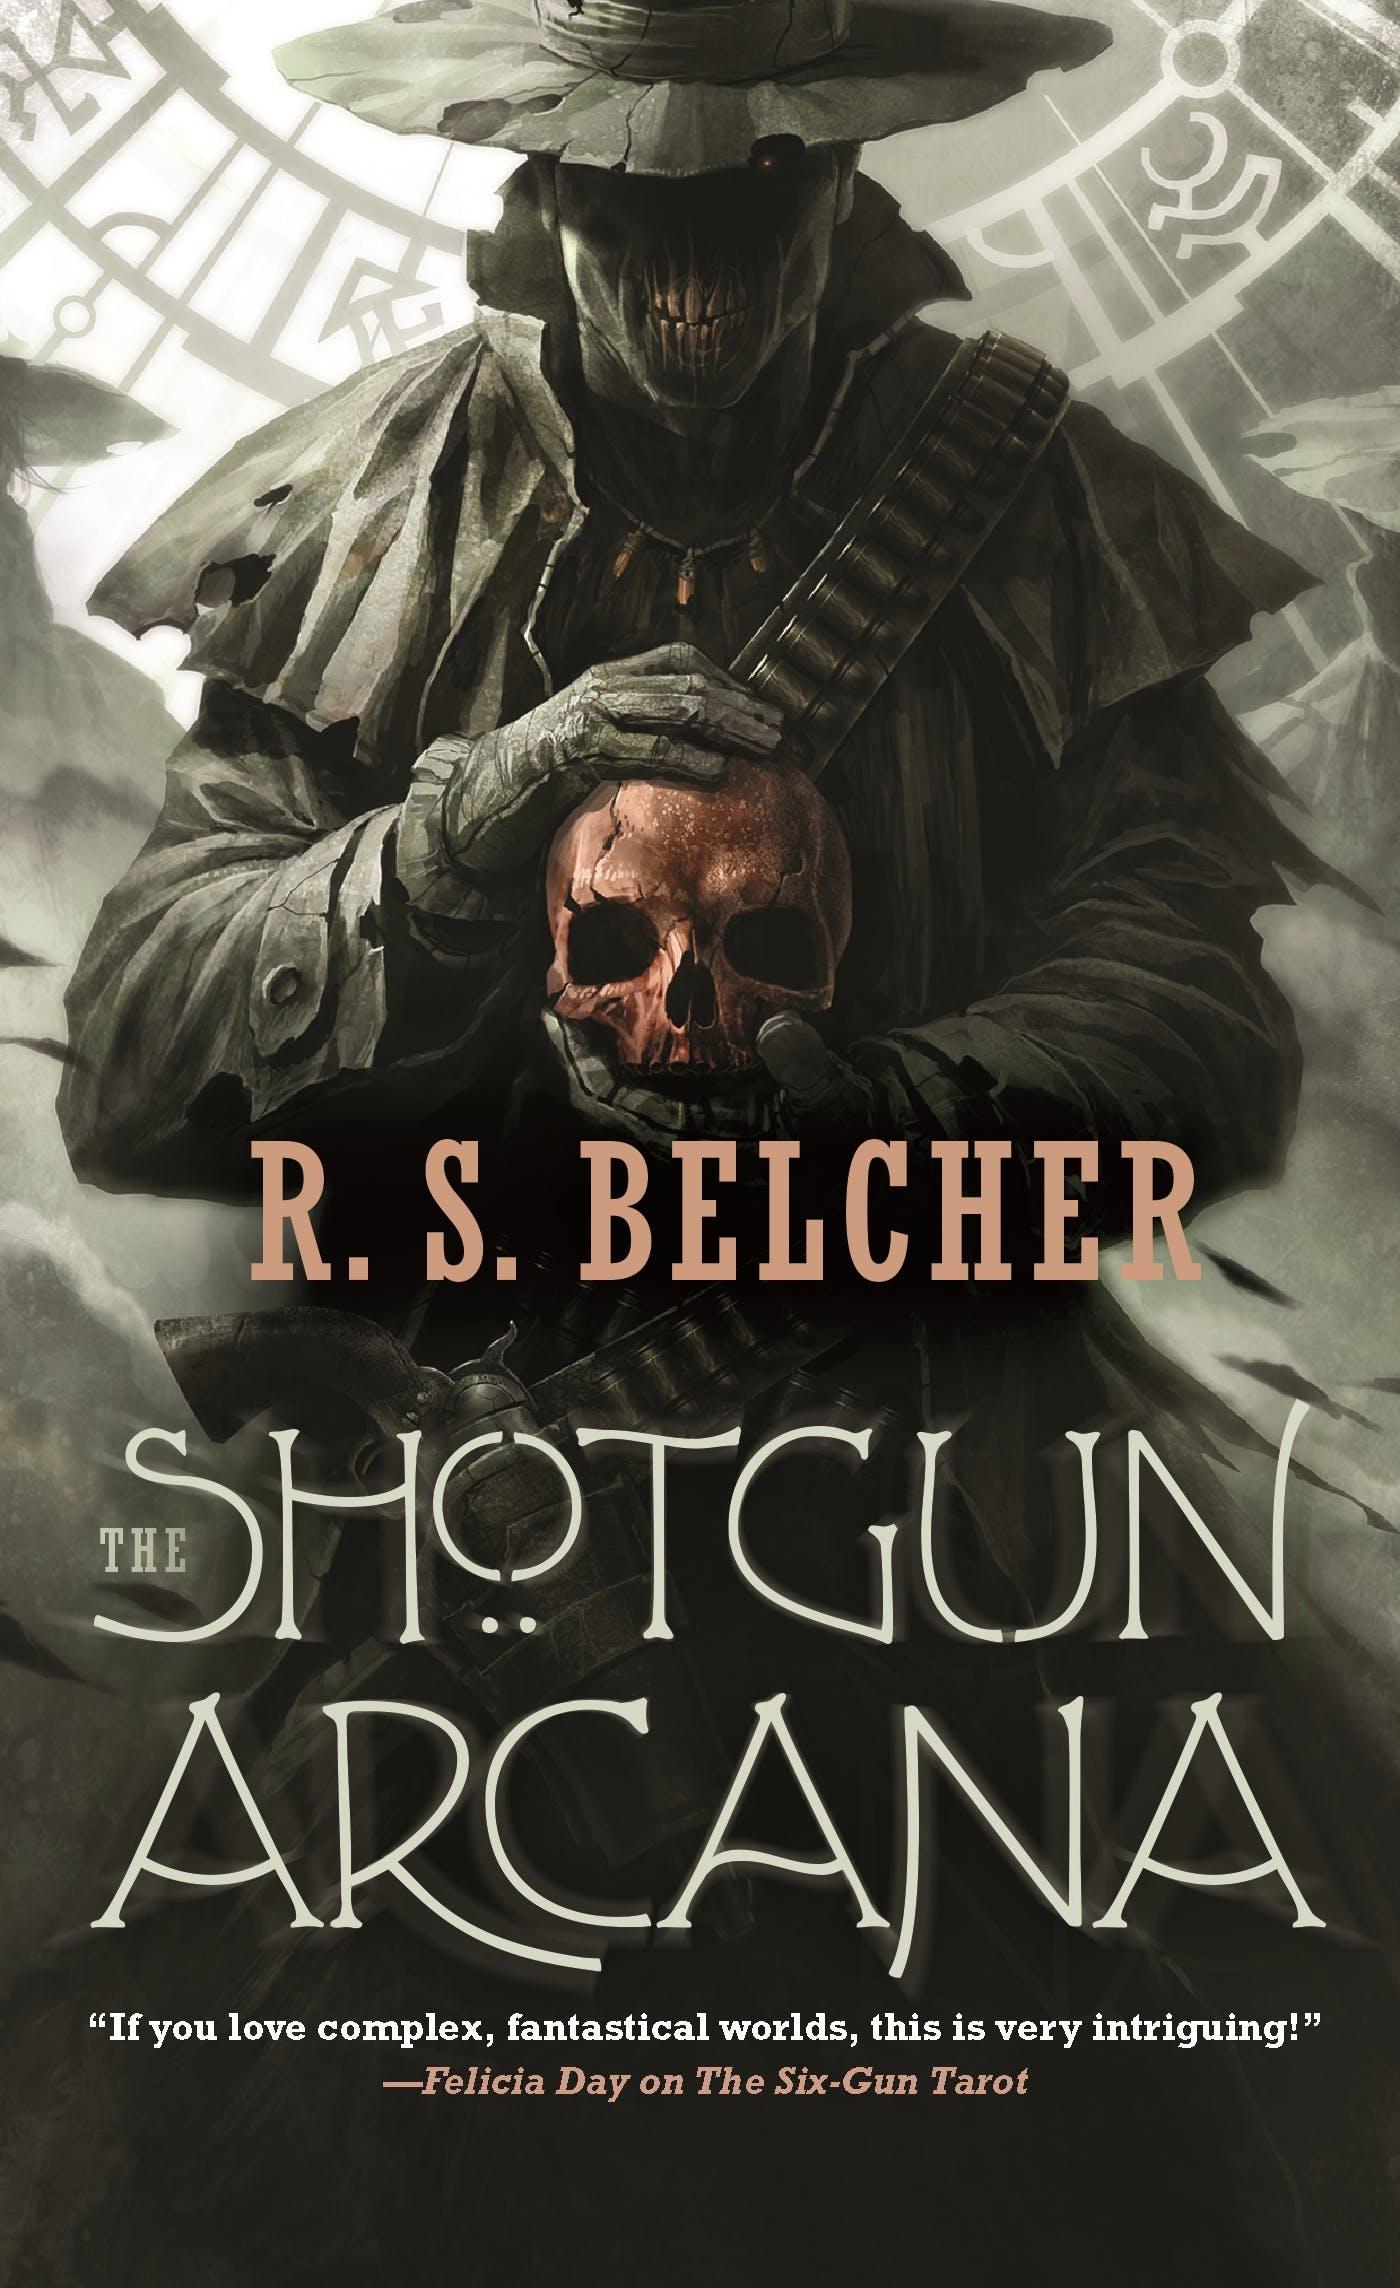 Image of The Shotgun Arcana